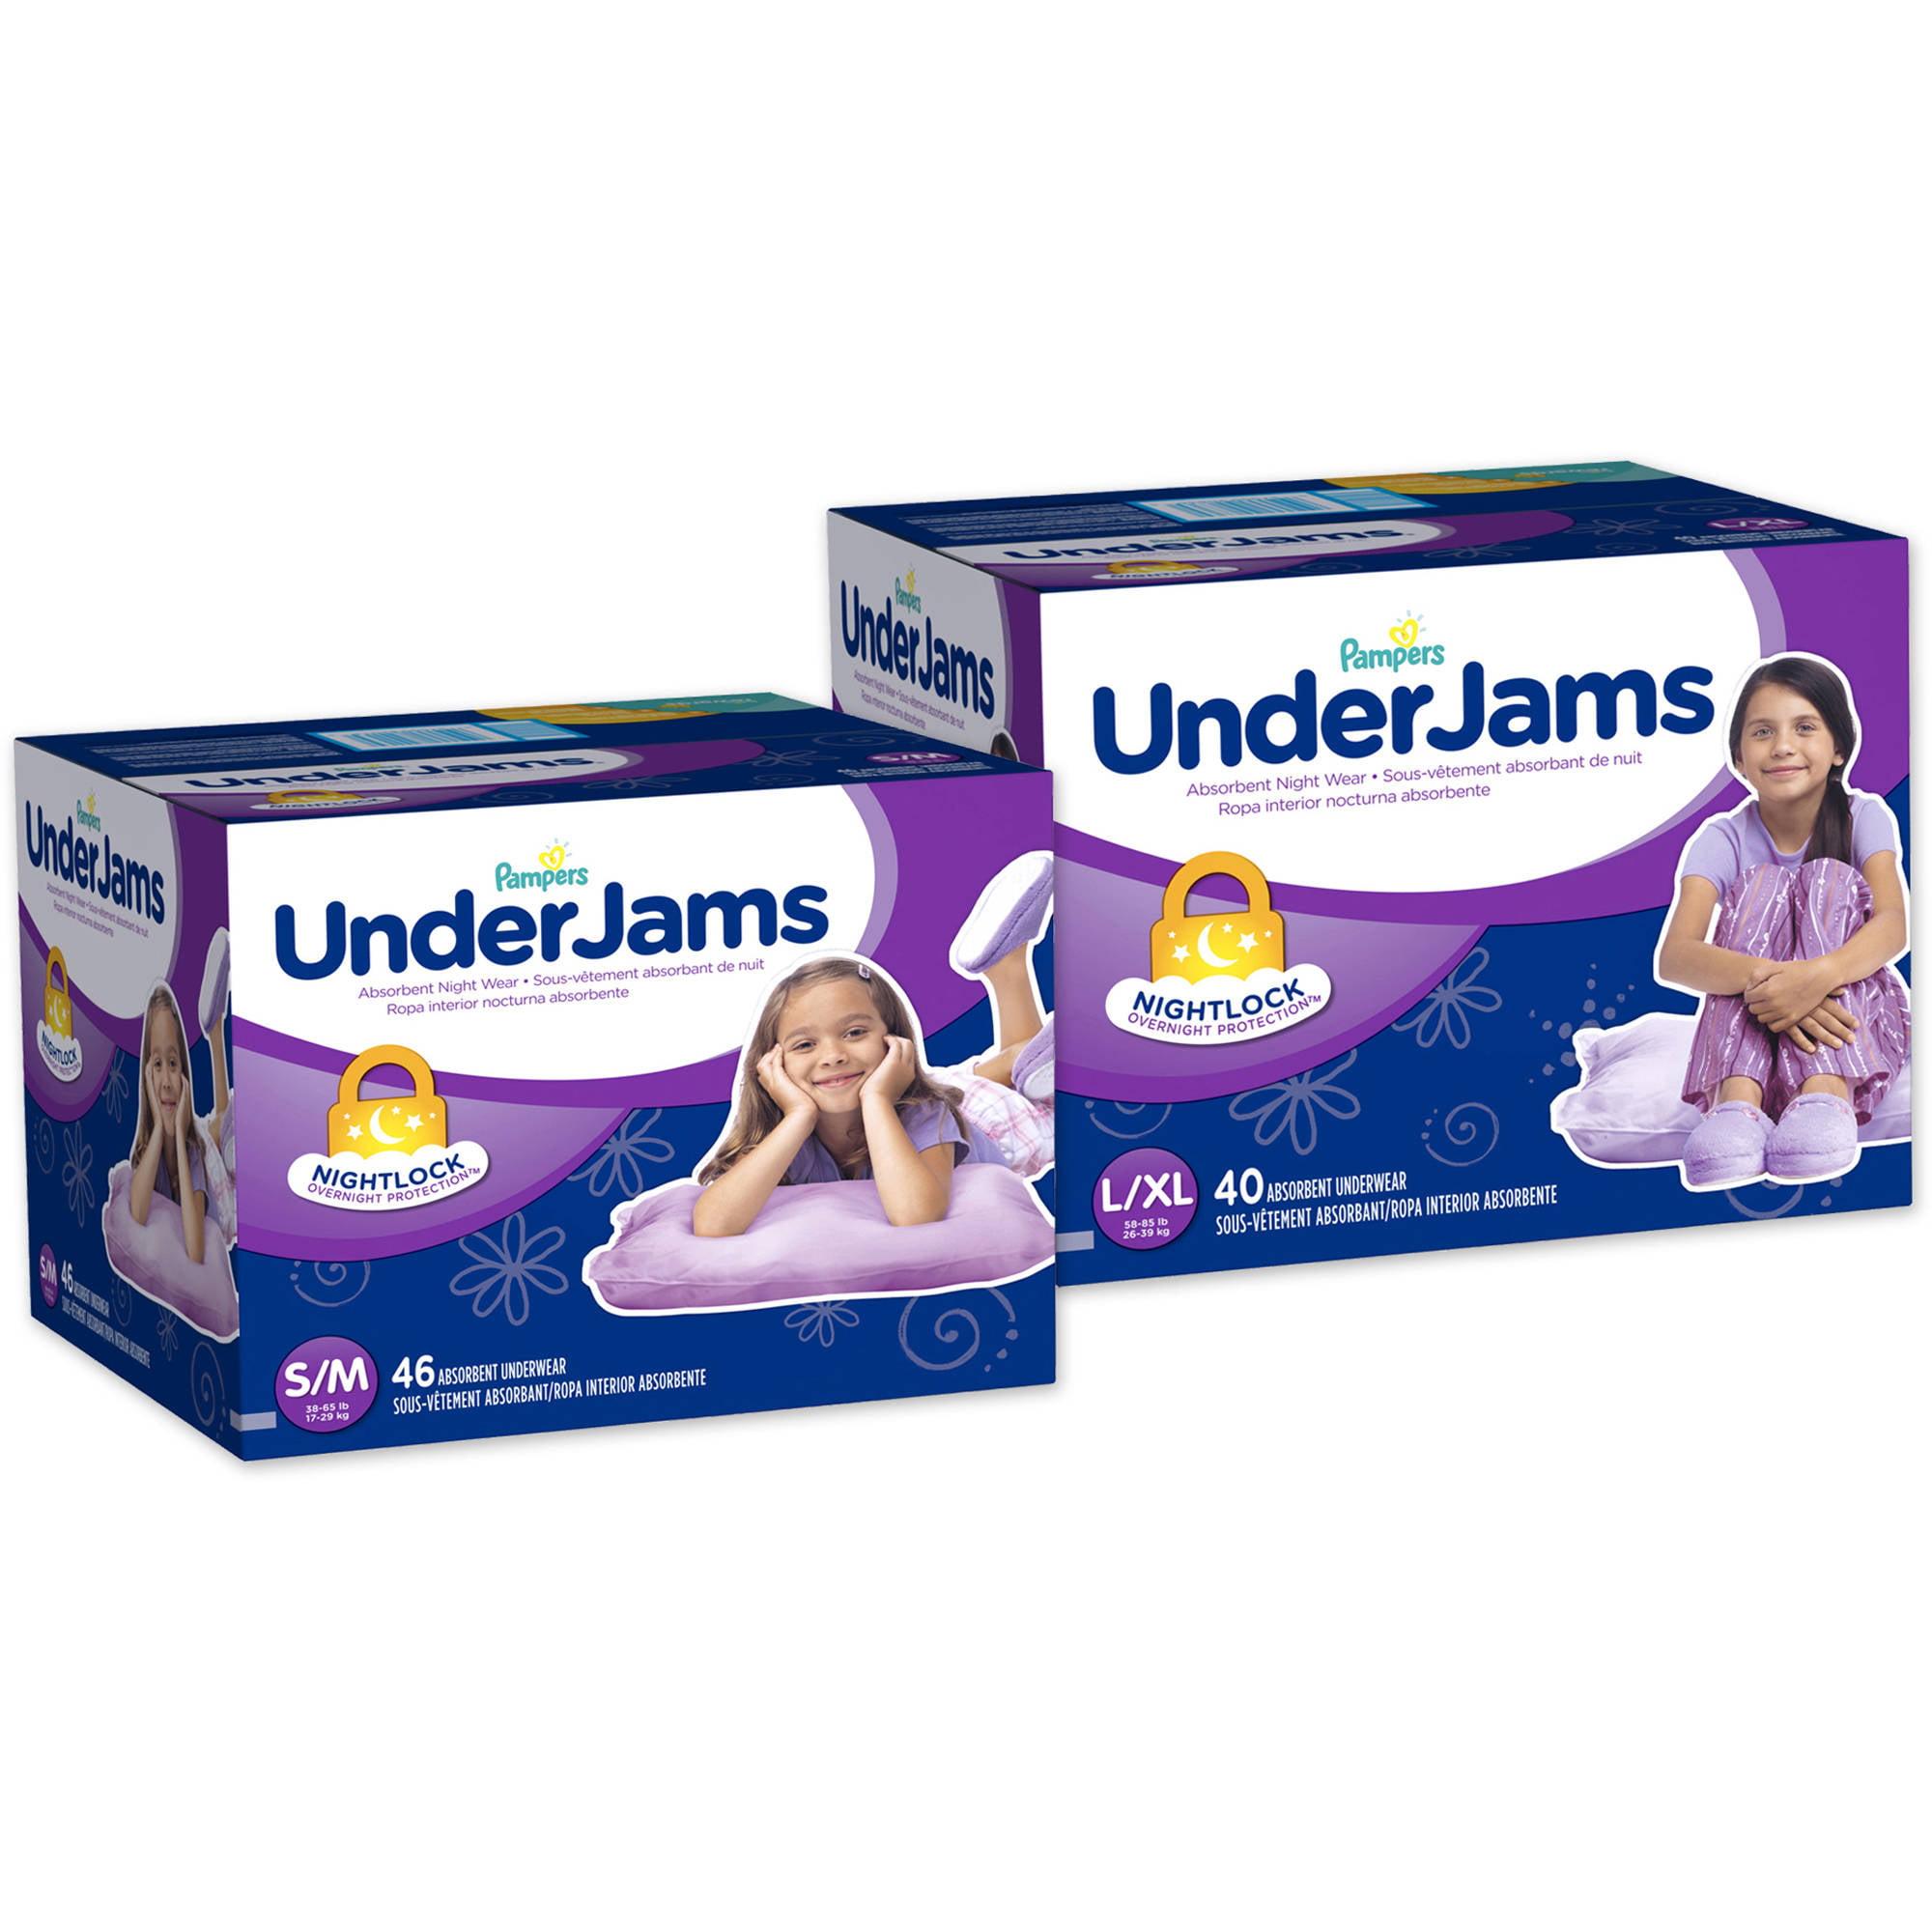 Pampers Girls' Underjams Absorbent Underwear, Big Pack (Choose Your Size)